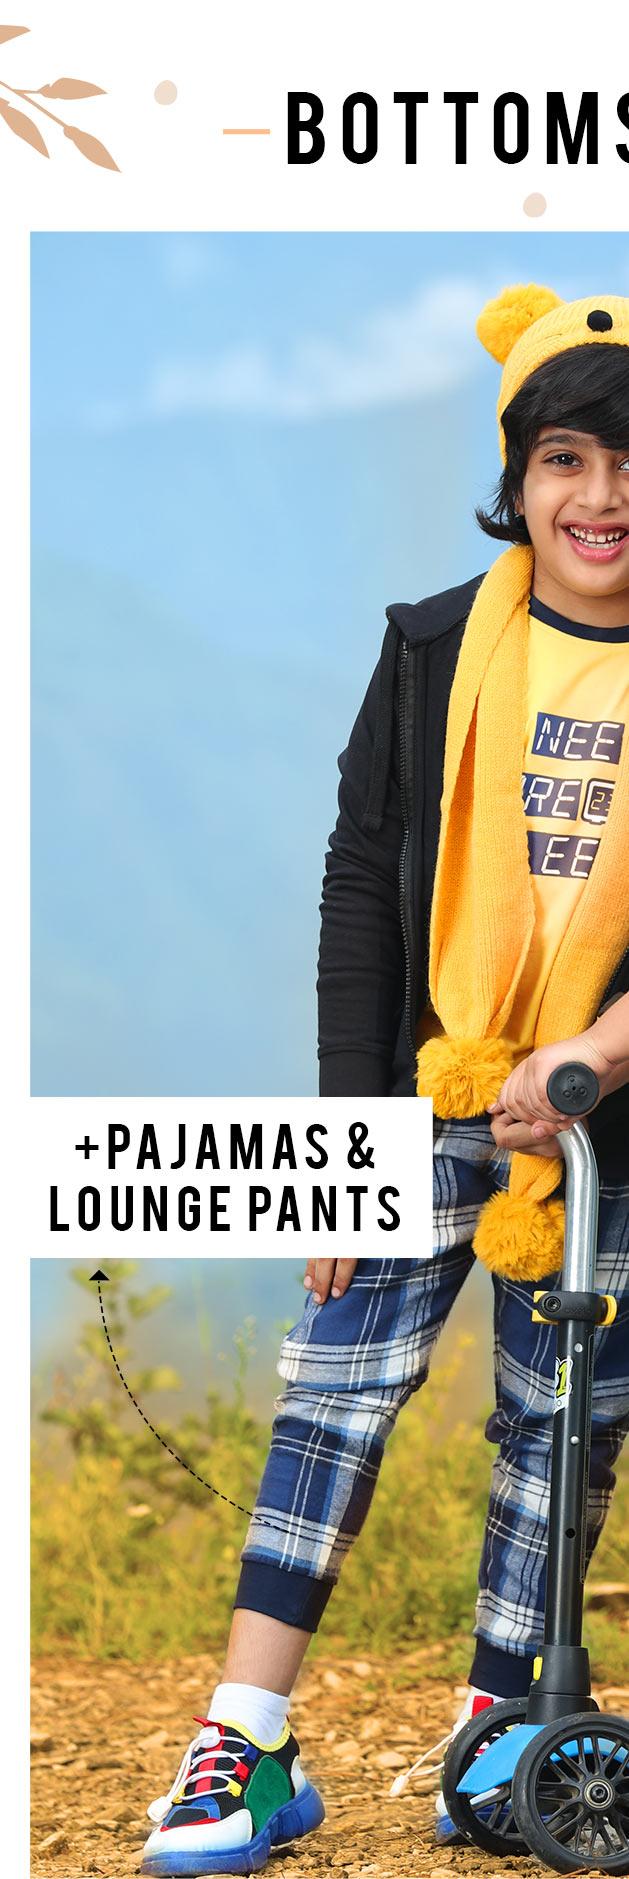 Pajamas & lounge pants